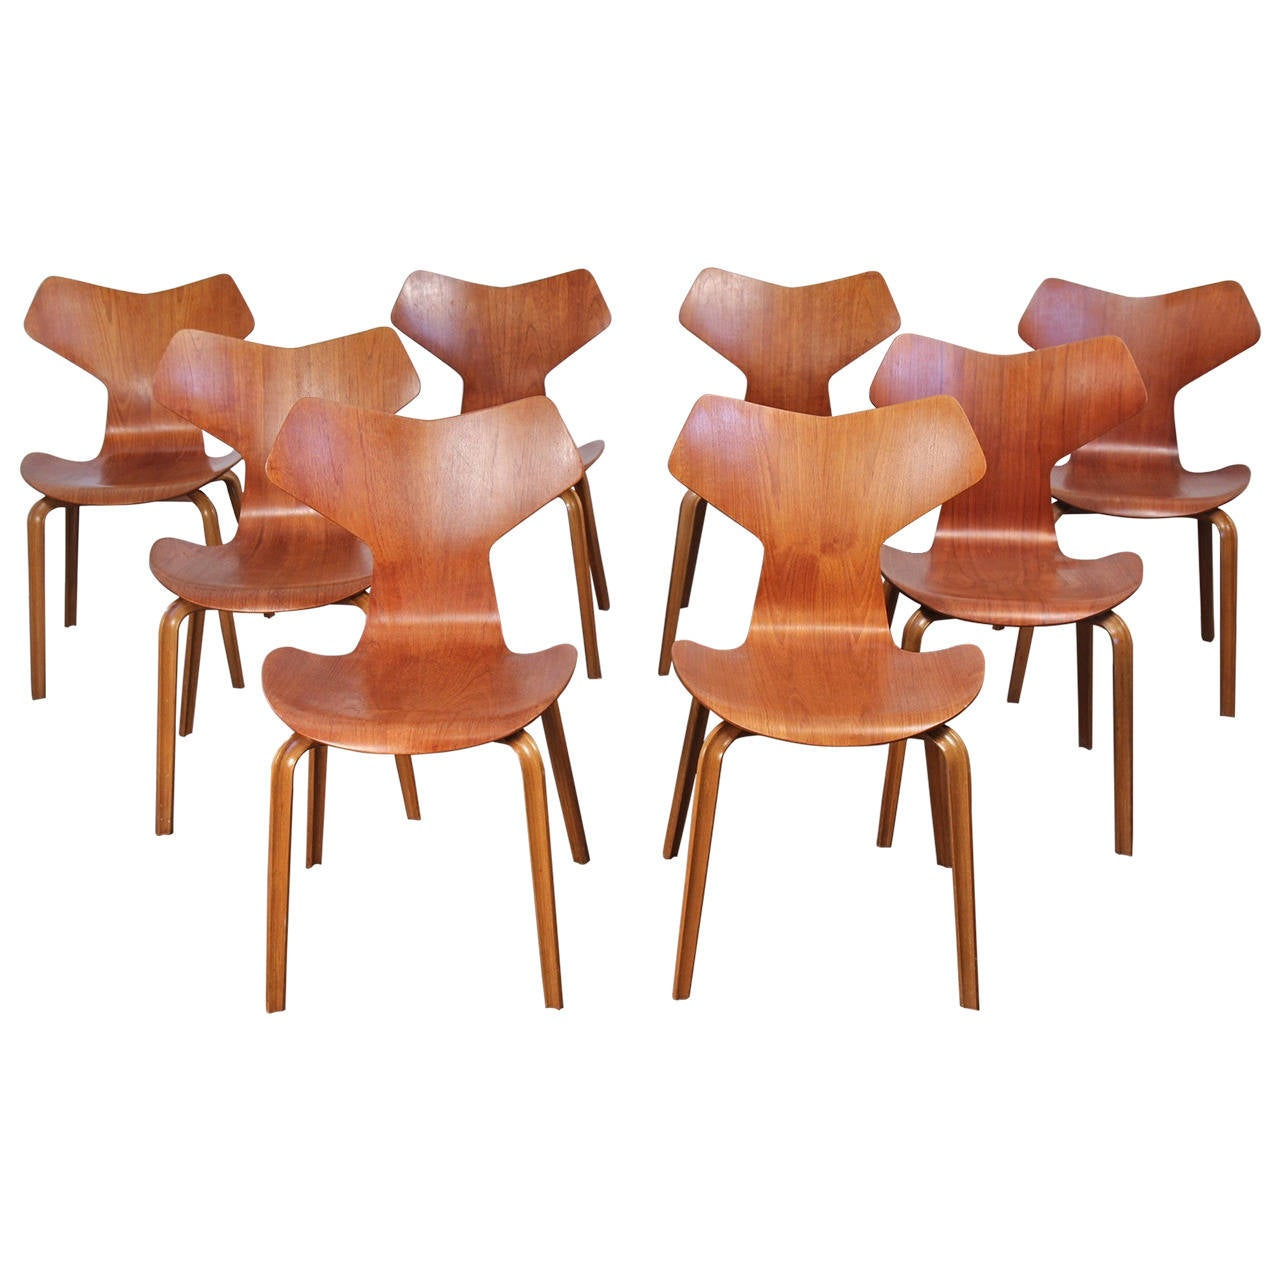 arne jacobsen grand prix chairs at 1stdibs. Black Bedroom Furniture Sets. Home Design Ideas